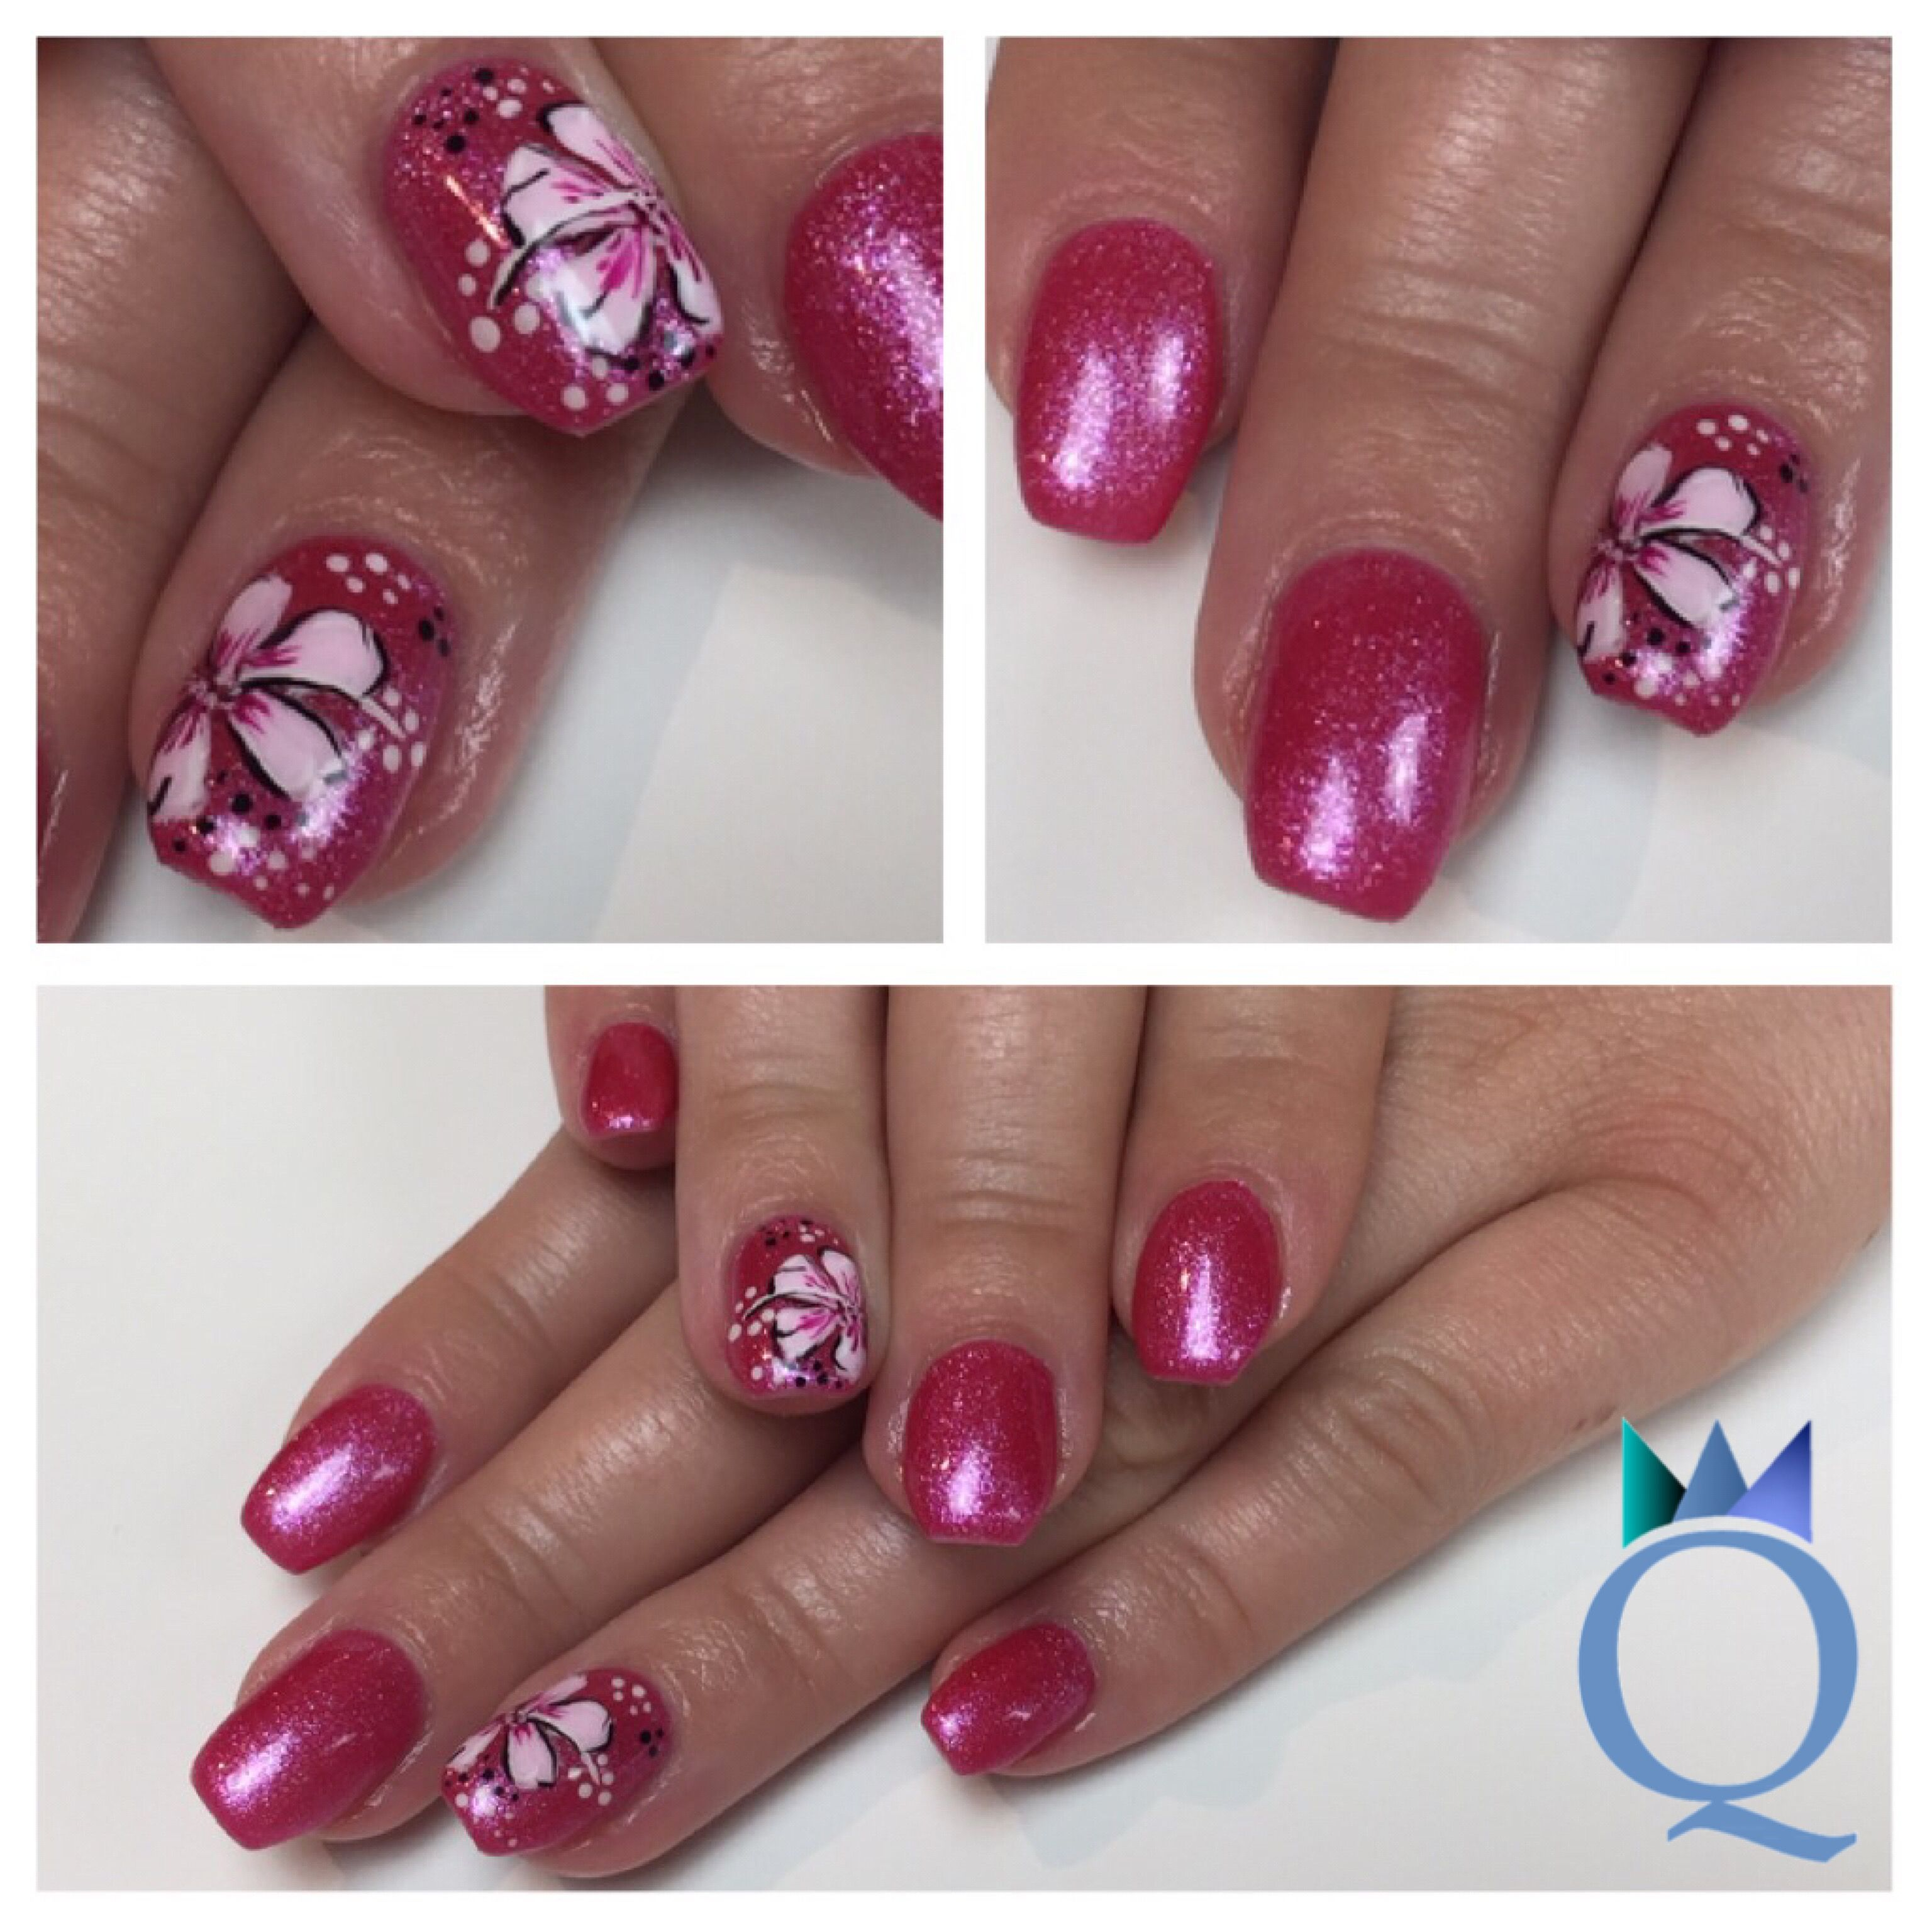 shortnails #coffinshape #ballerinanails #gelnails #nails #pink ...